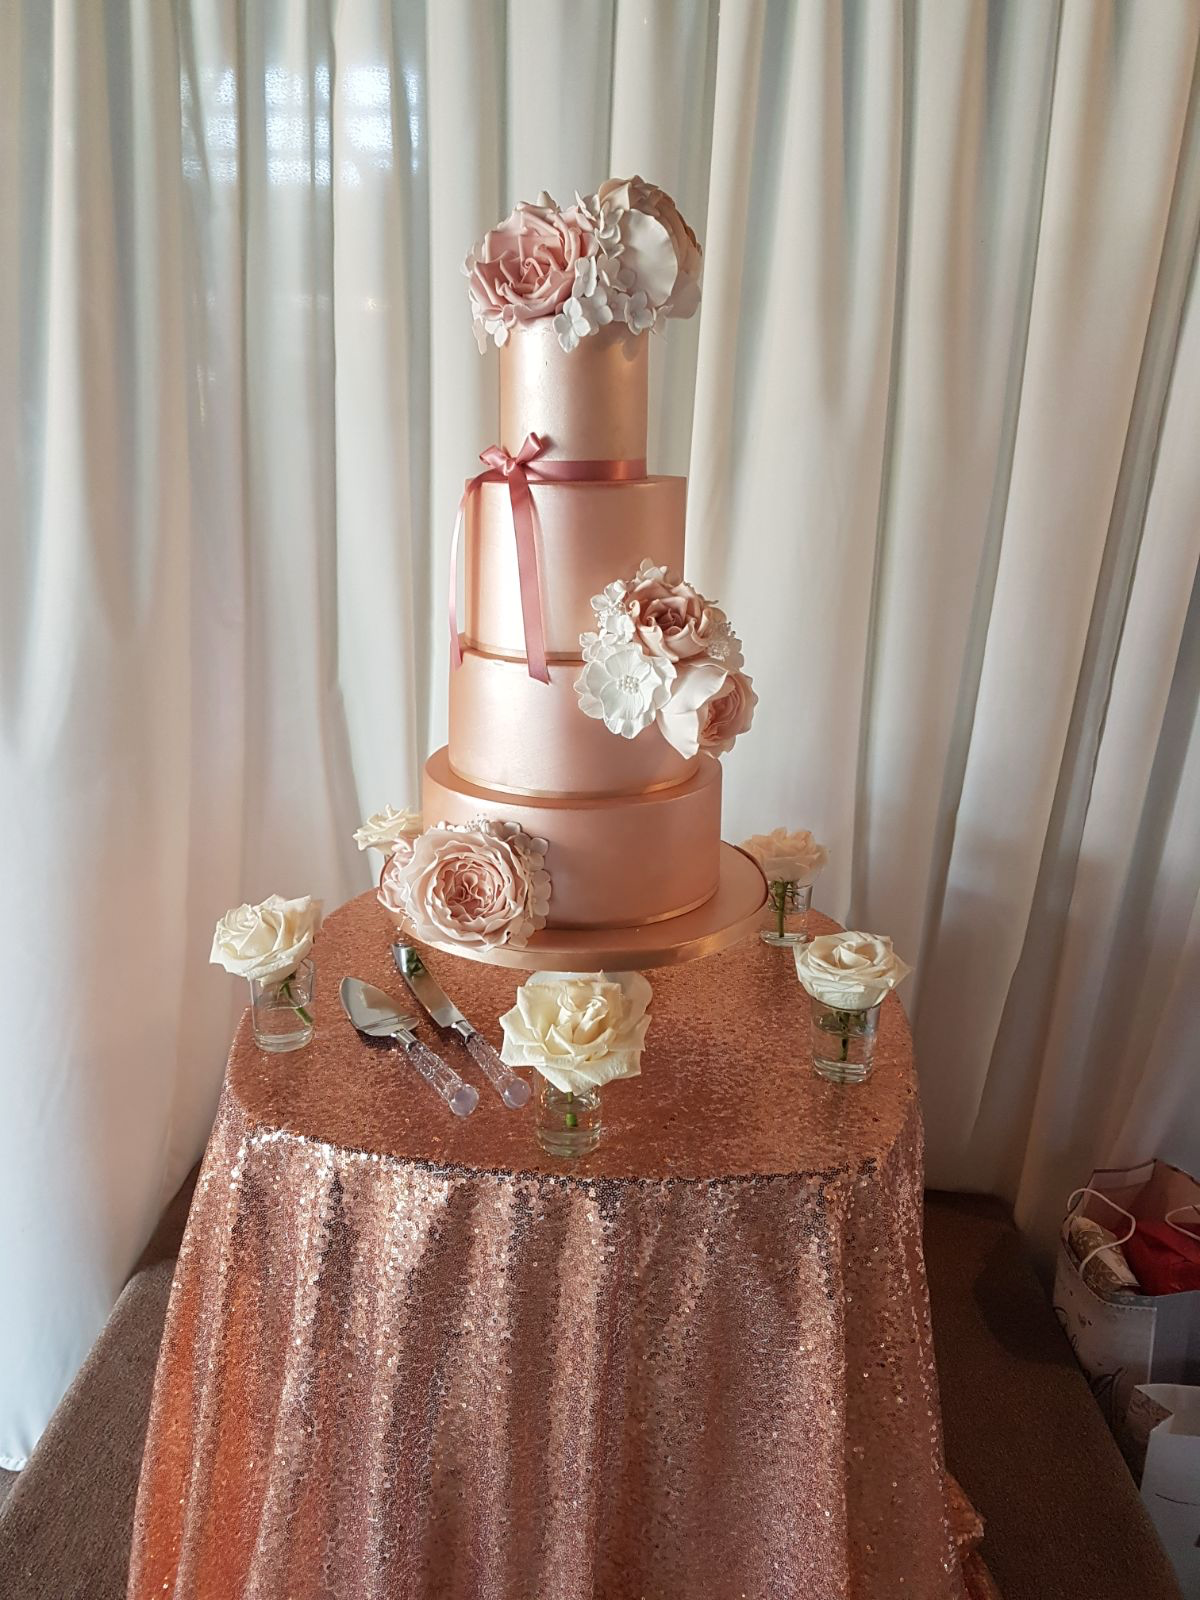 DOTTY ROSE CAKE DESIGN